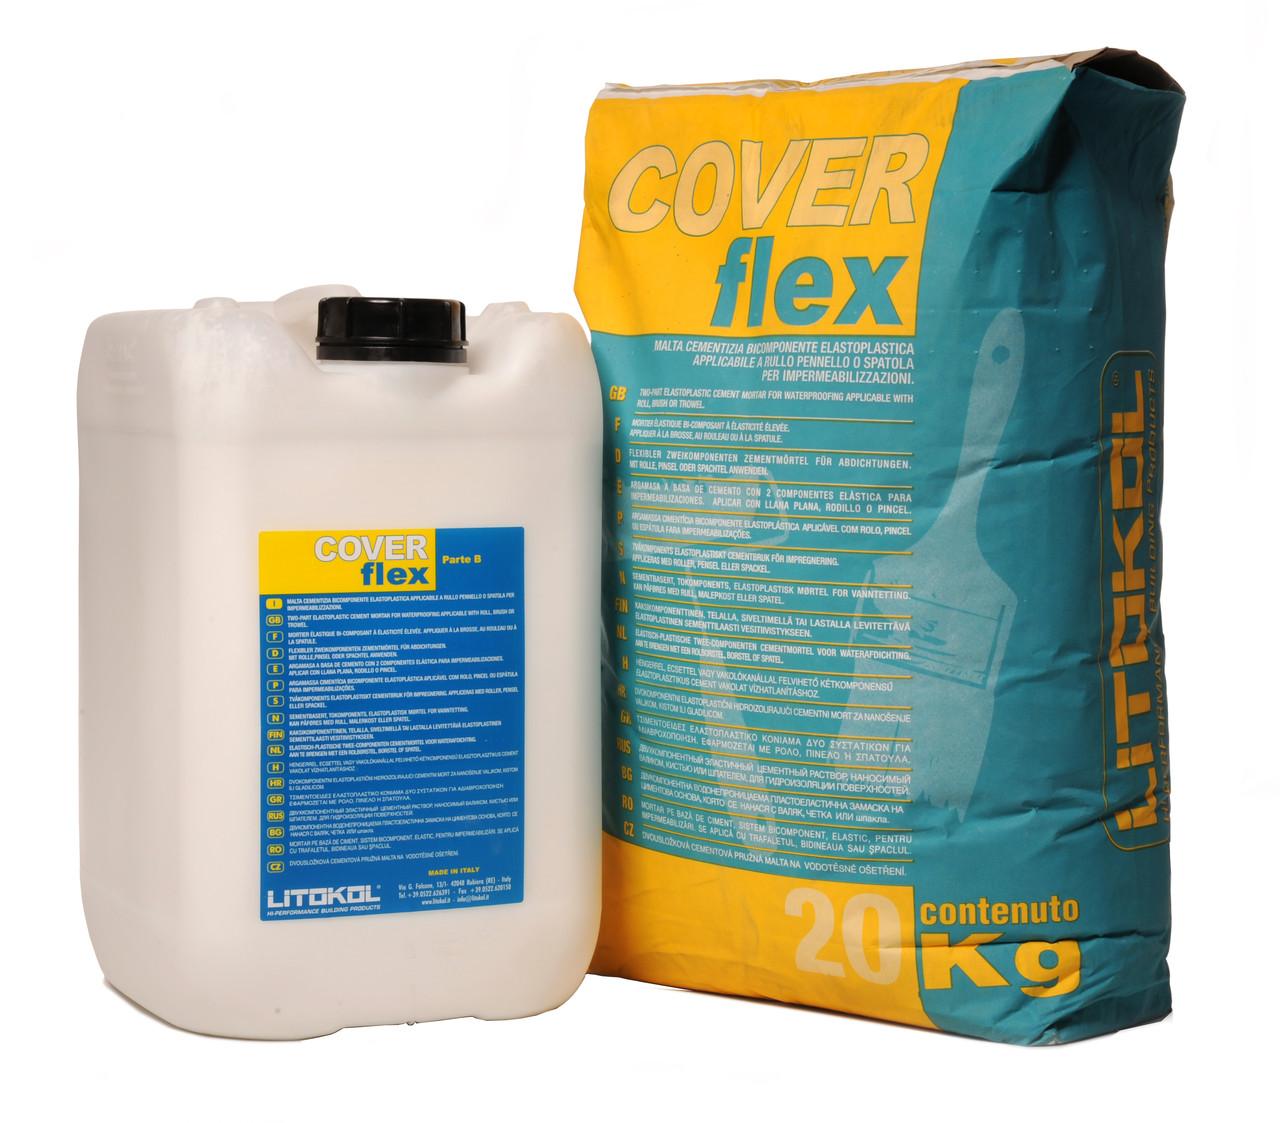 Гидроизоляция двухкомпонентная эластичная Litokol Coverflex (коверфлекс) A+B, (20 кг+10 кг), 30 кг